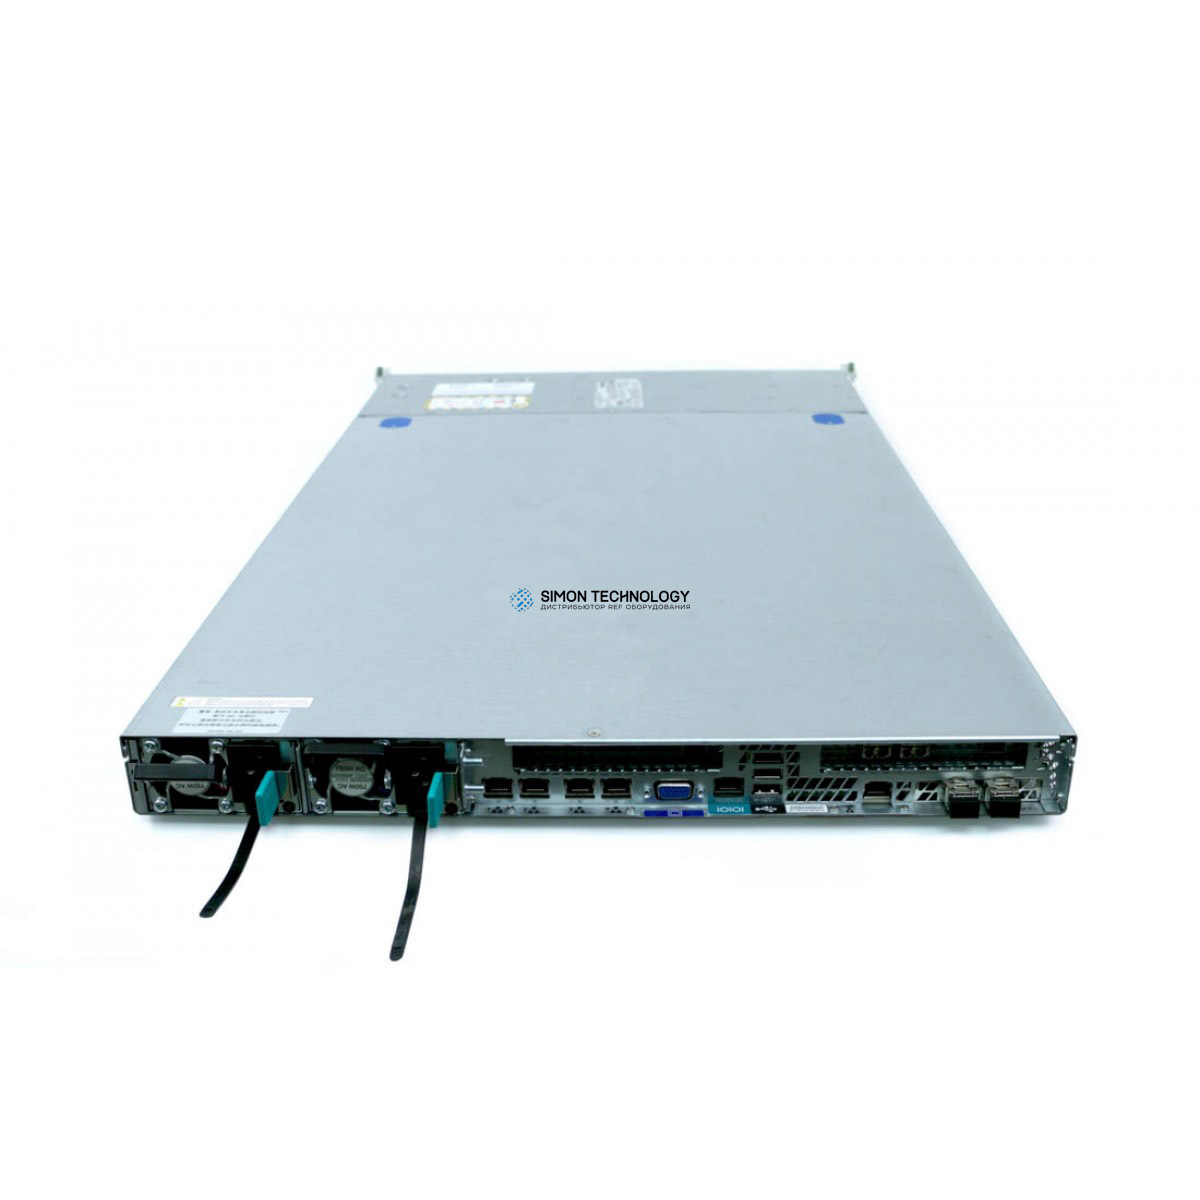 Сервер EMC XTREMIO MGMT KYLIN SERVER (100-586-008-01)